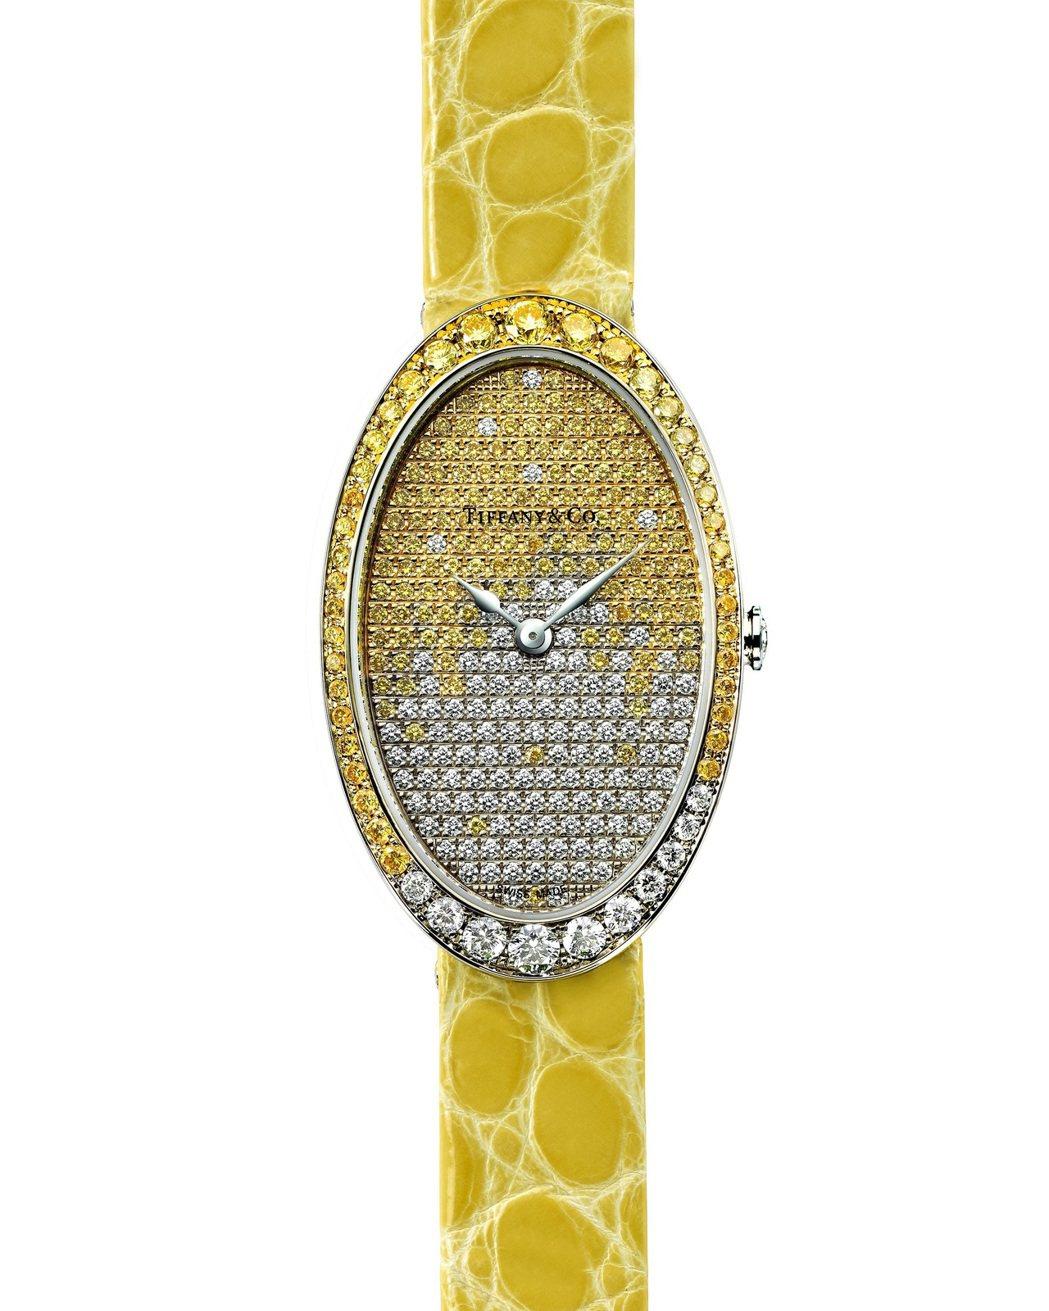 Tiffany Cocktail鋪鑲黃鑽與白鑽腕表,104萬元。圖/Tiffan...